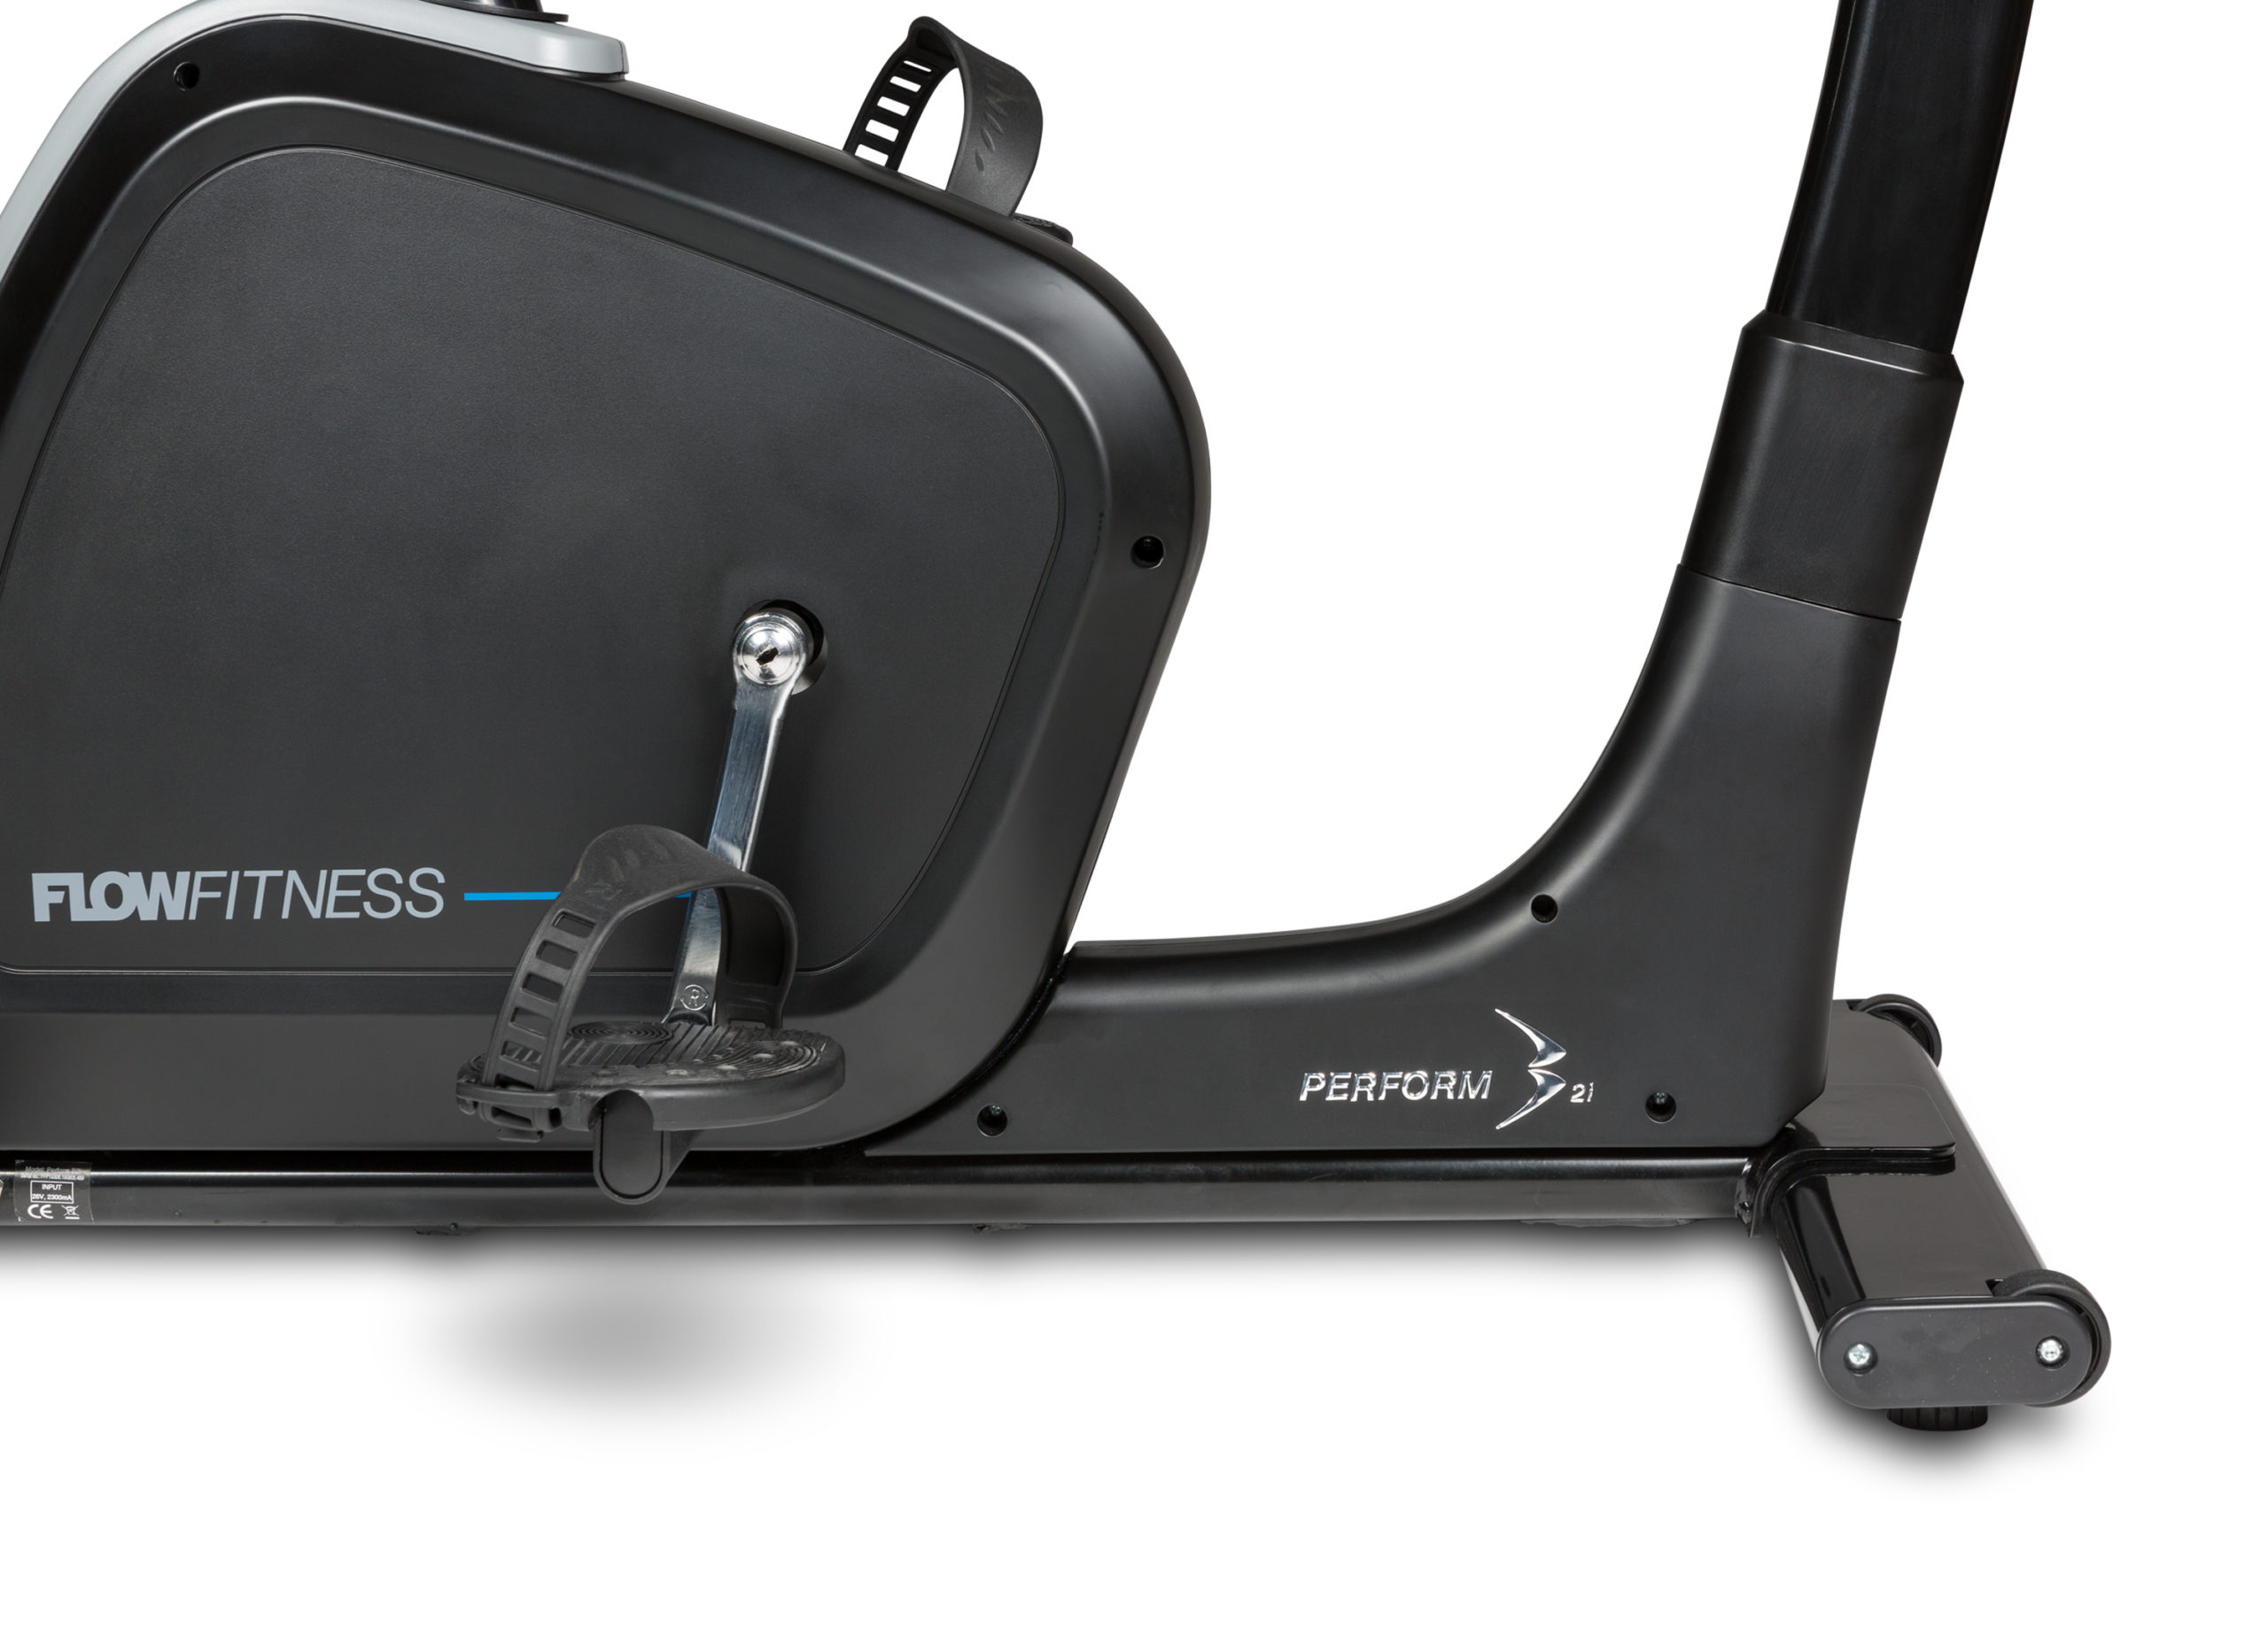 Flow Fitness Tabel PERFORM B2i Ergometer 11